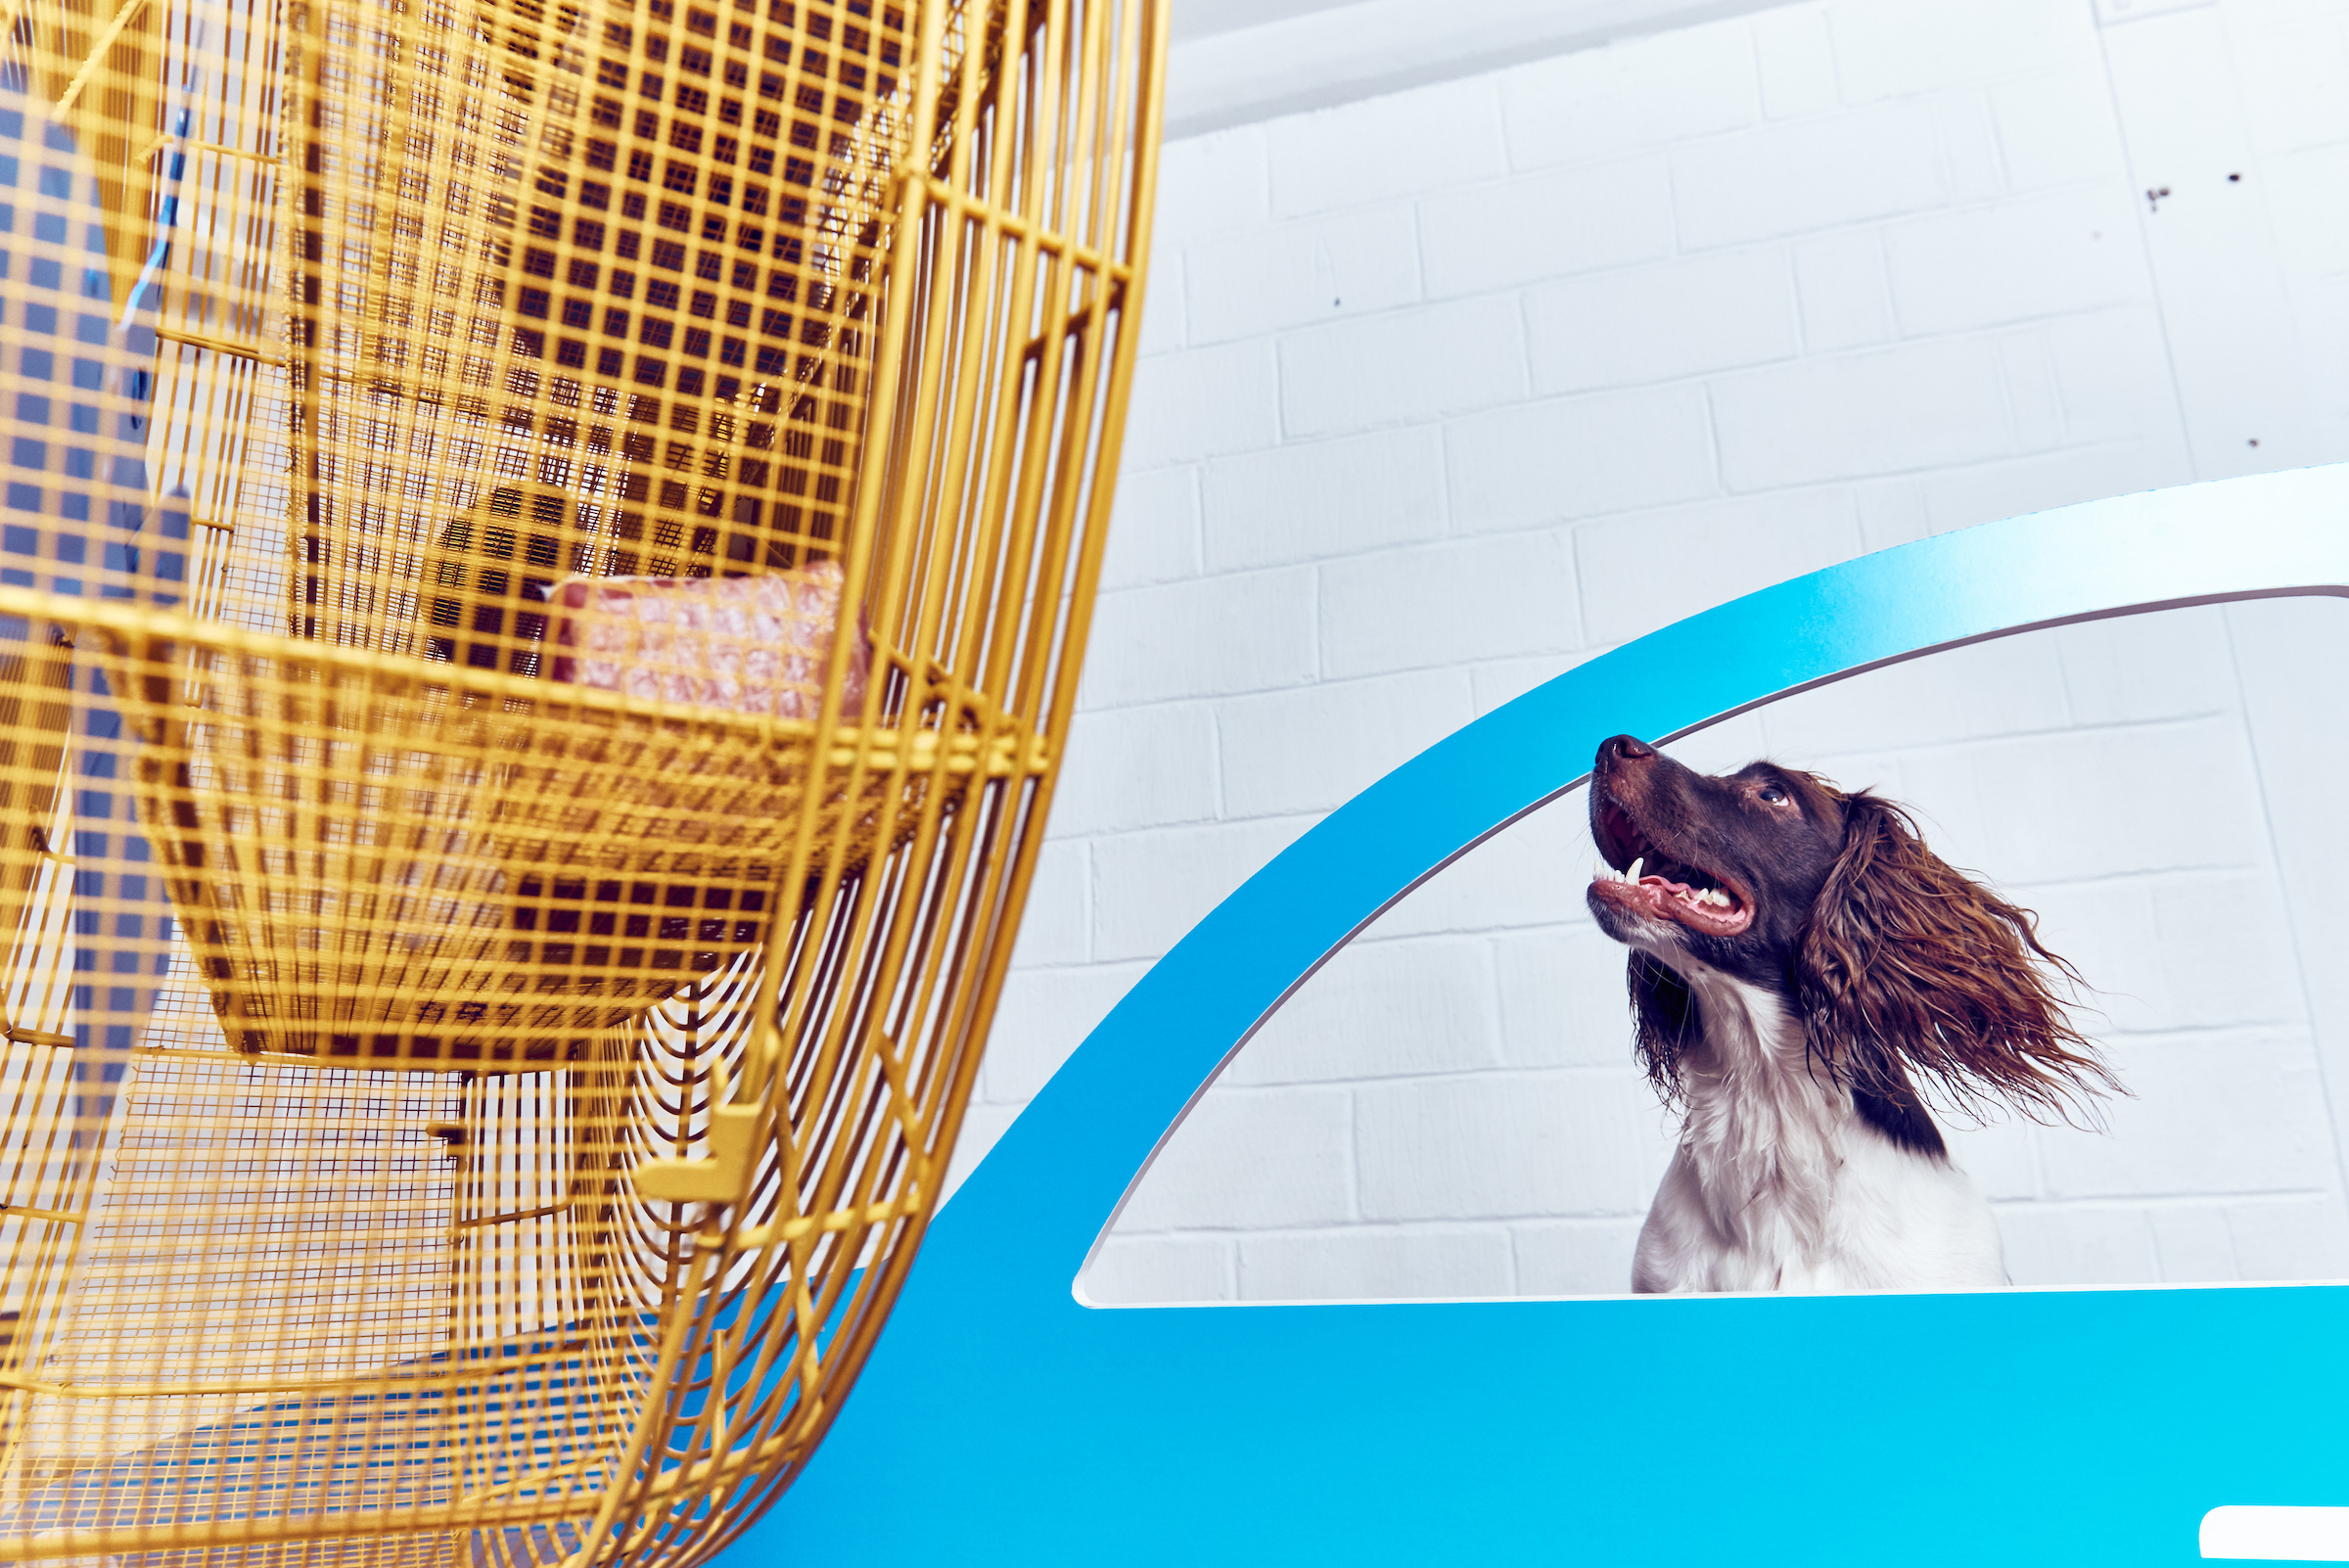 BUCK_Dogs_Exhibition-10.jpg